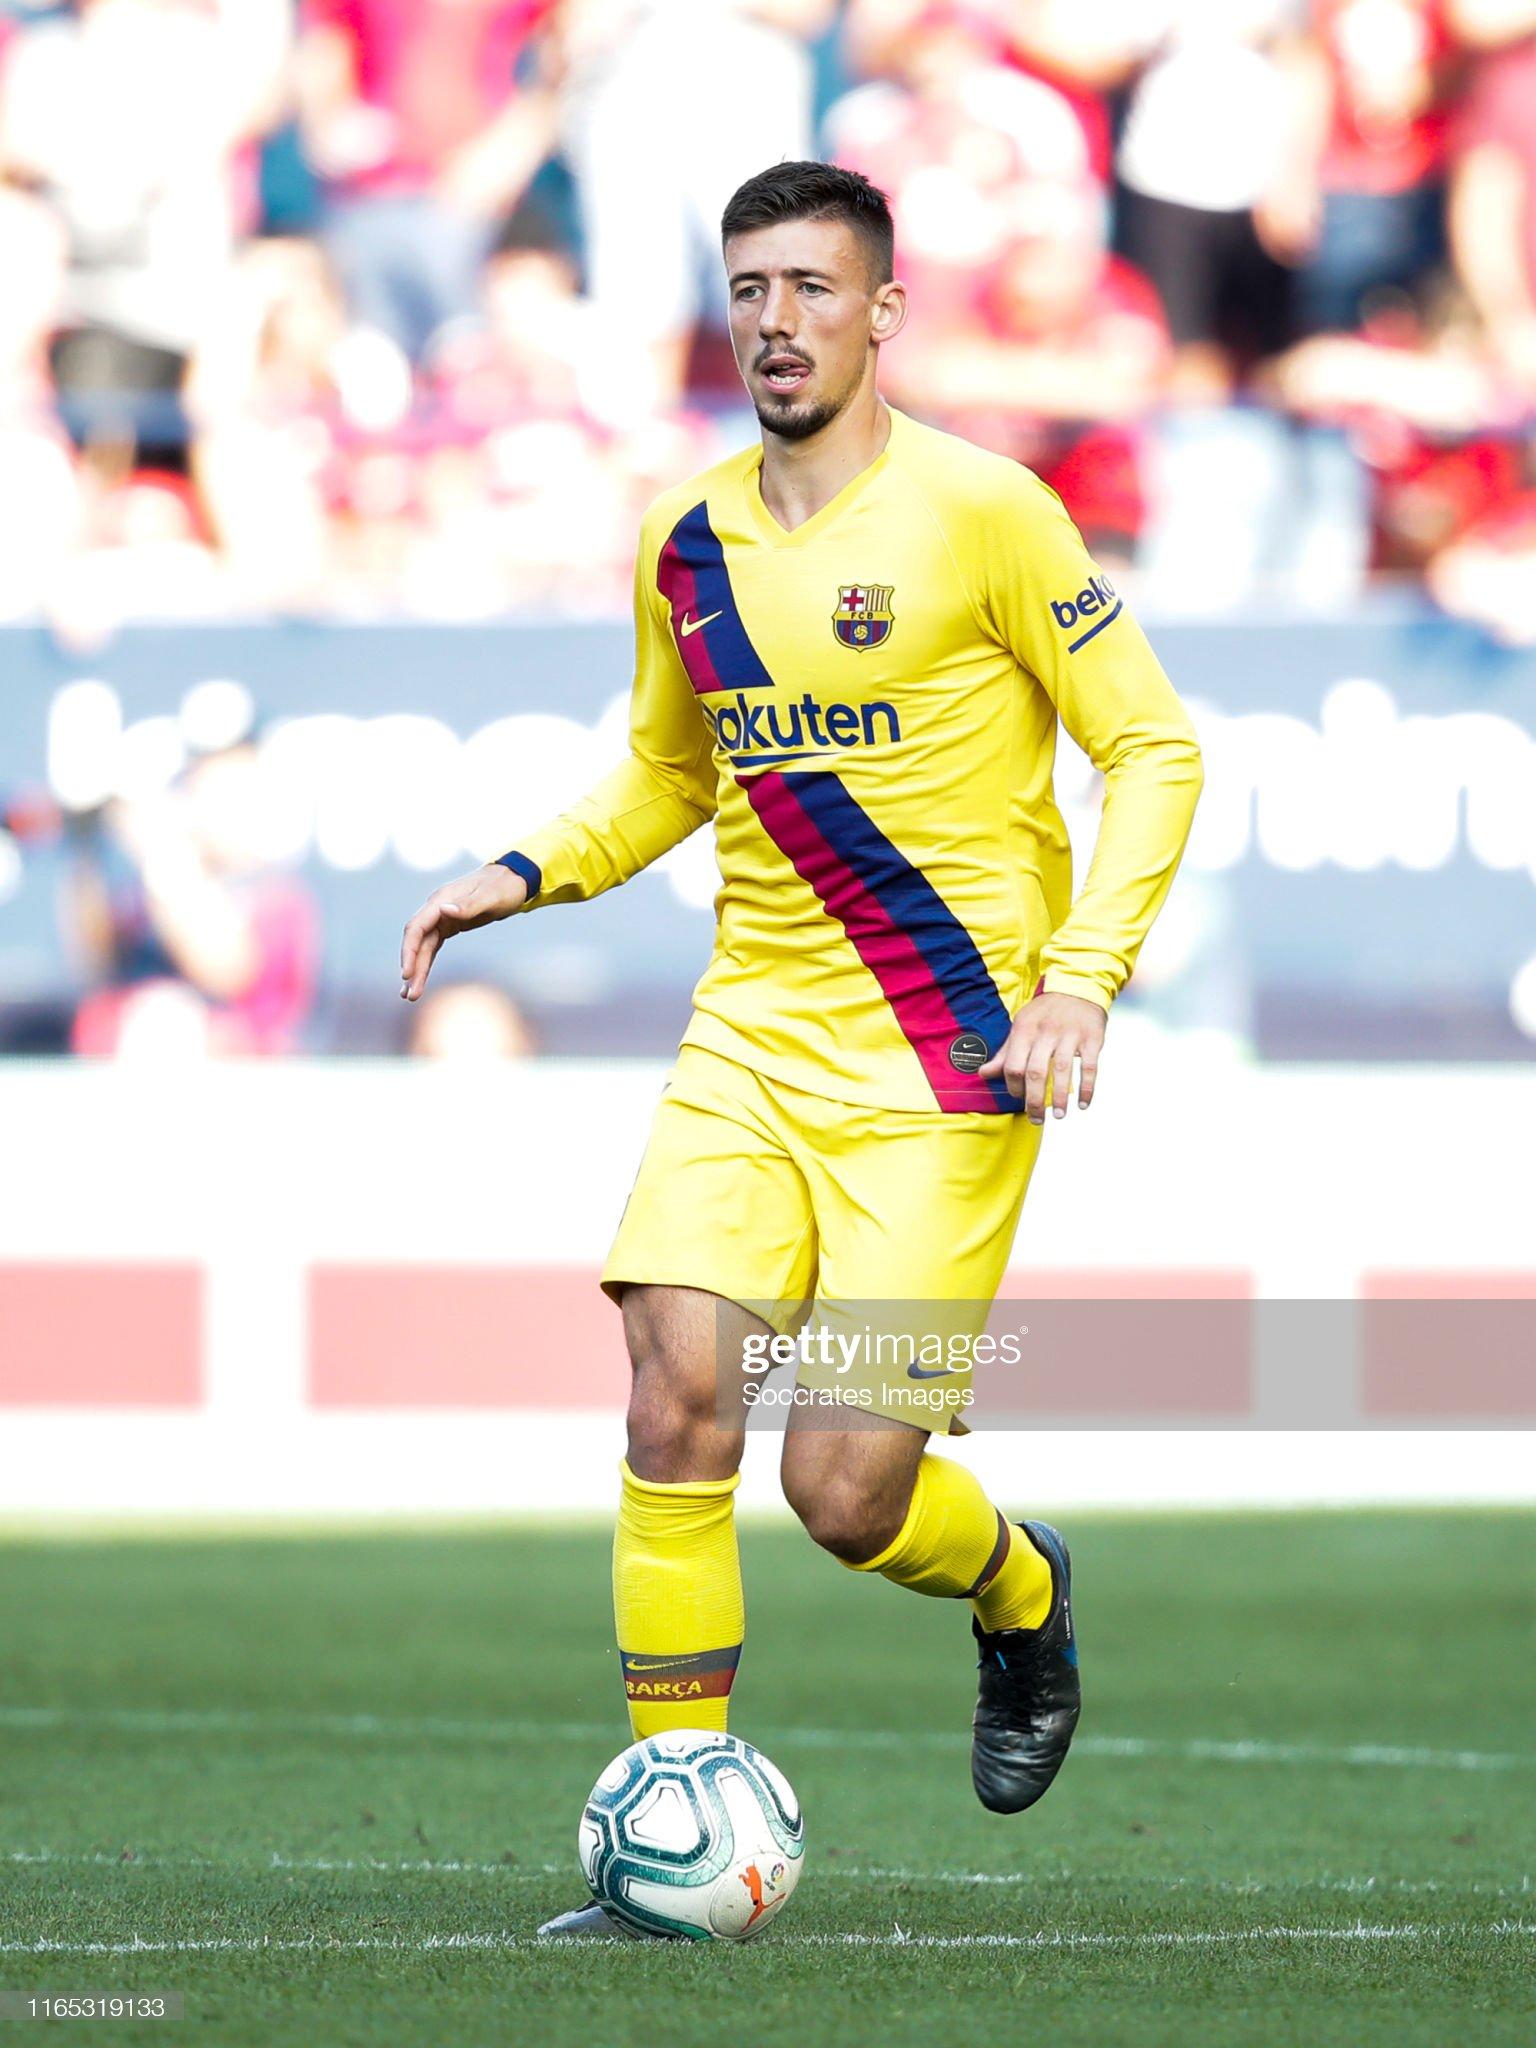 صور مباراة : أوساسونا - برشلونة 2-2 ( 31-08-2019 )  Clement-lenglet-of-fc-barcelona-during-the-la-liga-santander-match-picture-id1165319133?s=2048x2048